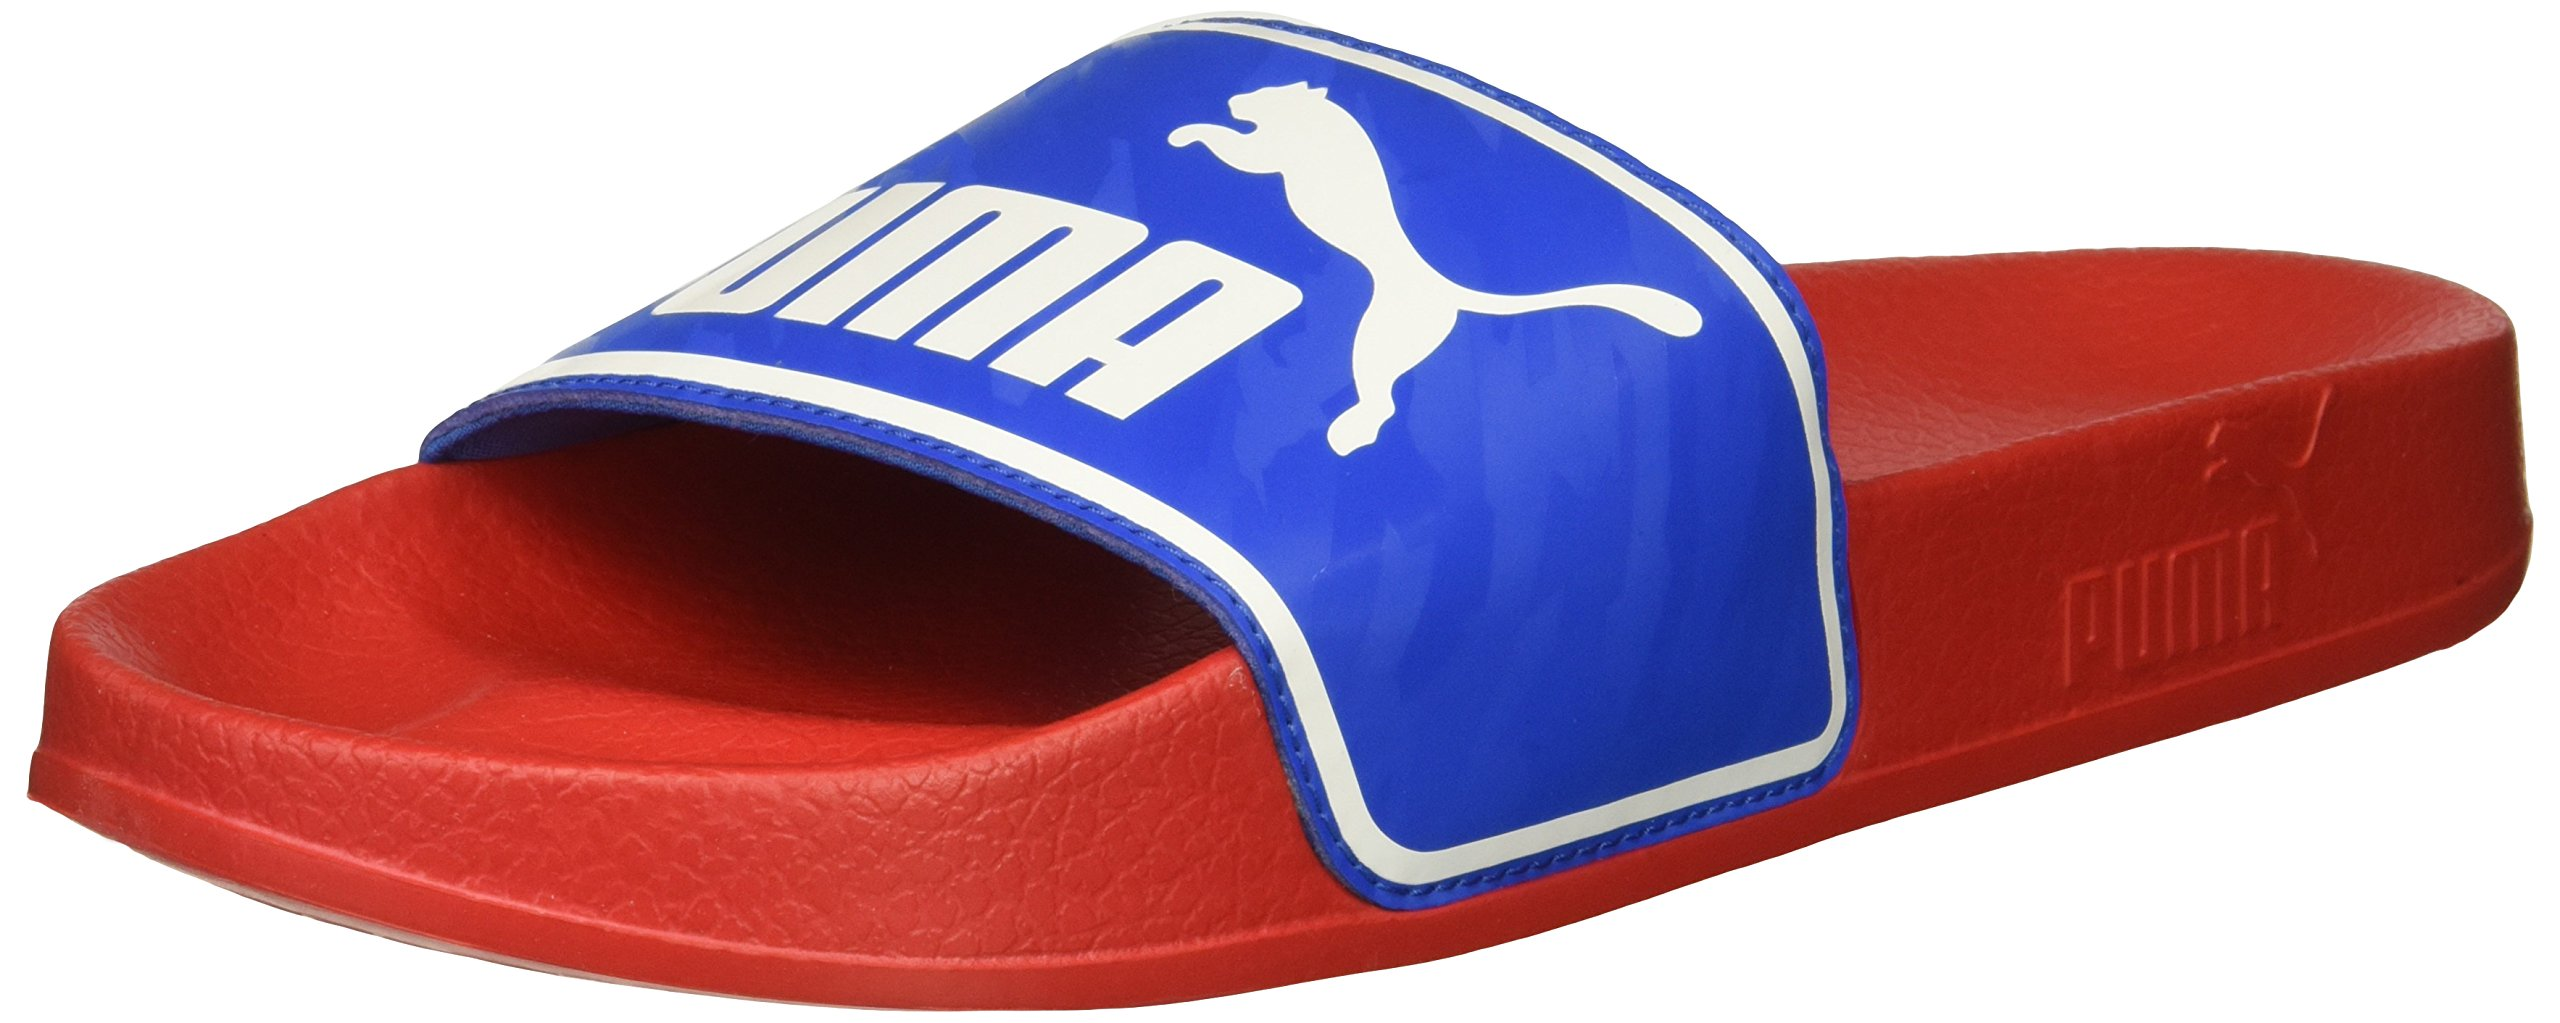 PUMA Unisex Leadcat New Skool Kids Slide Sandal, Ribbon red-Strong Blue White, 6 M US Big